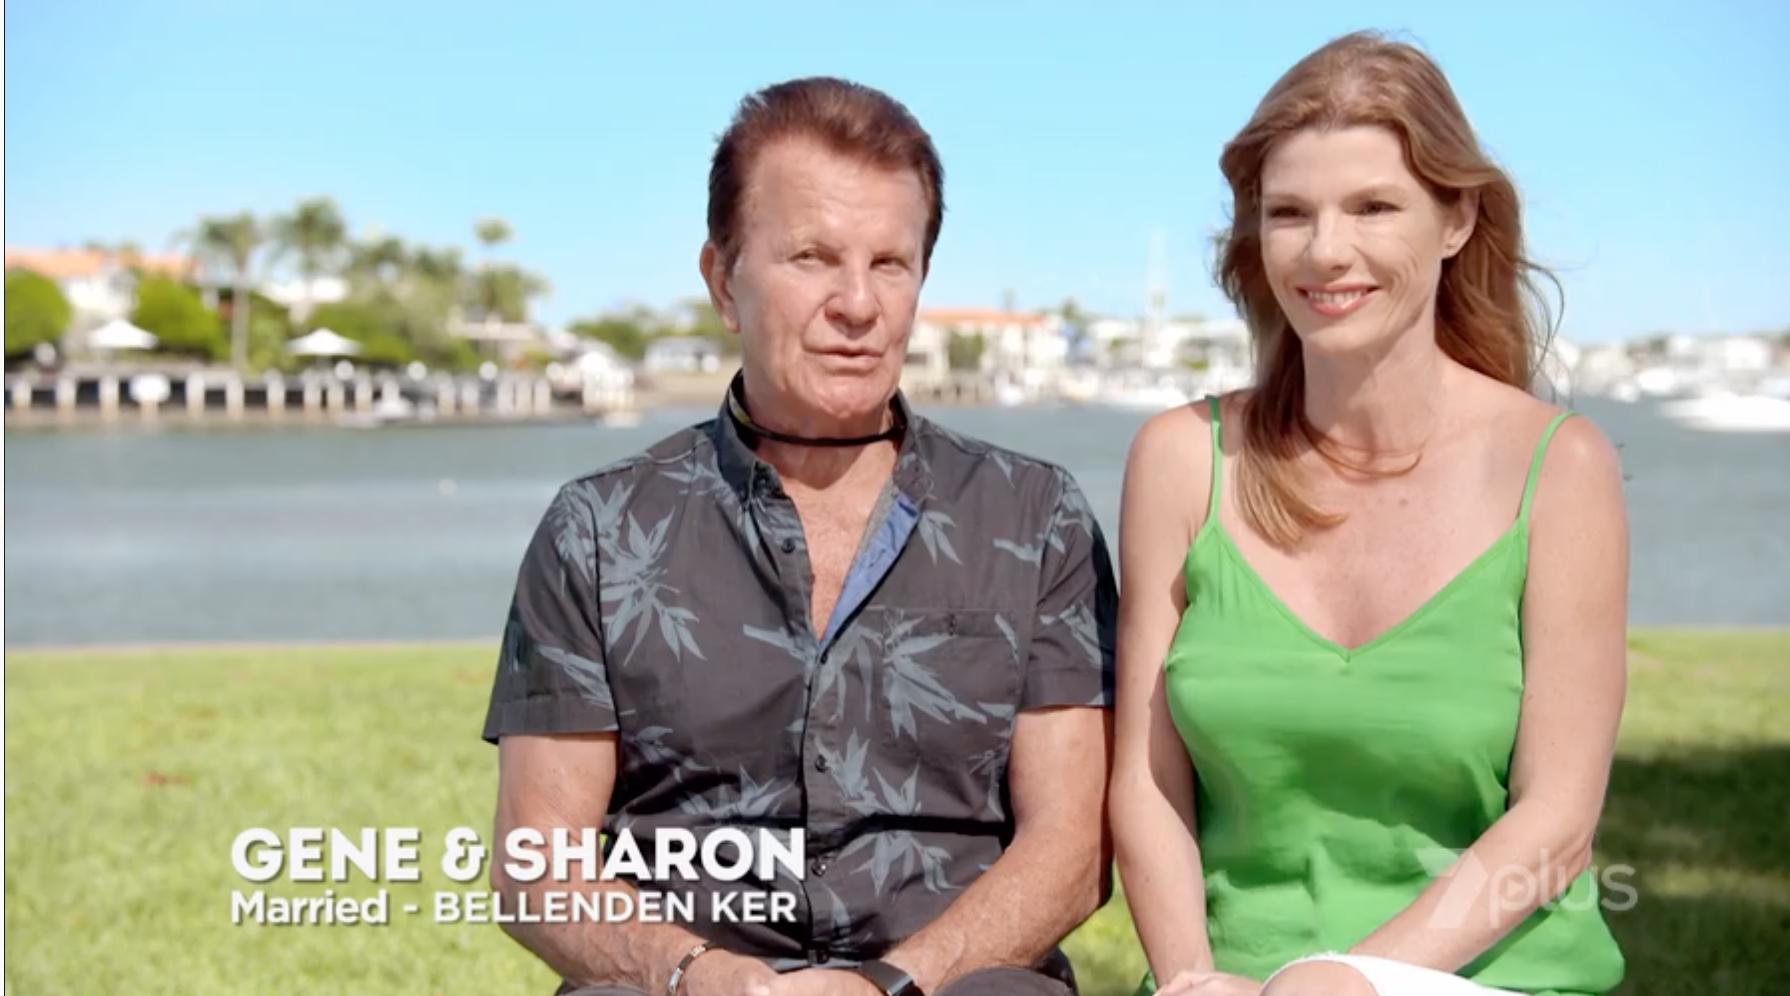 Sharon and Gene